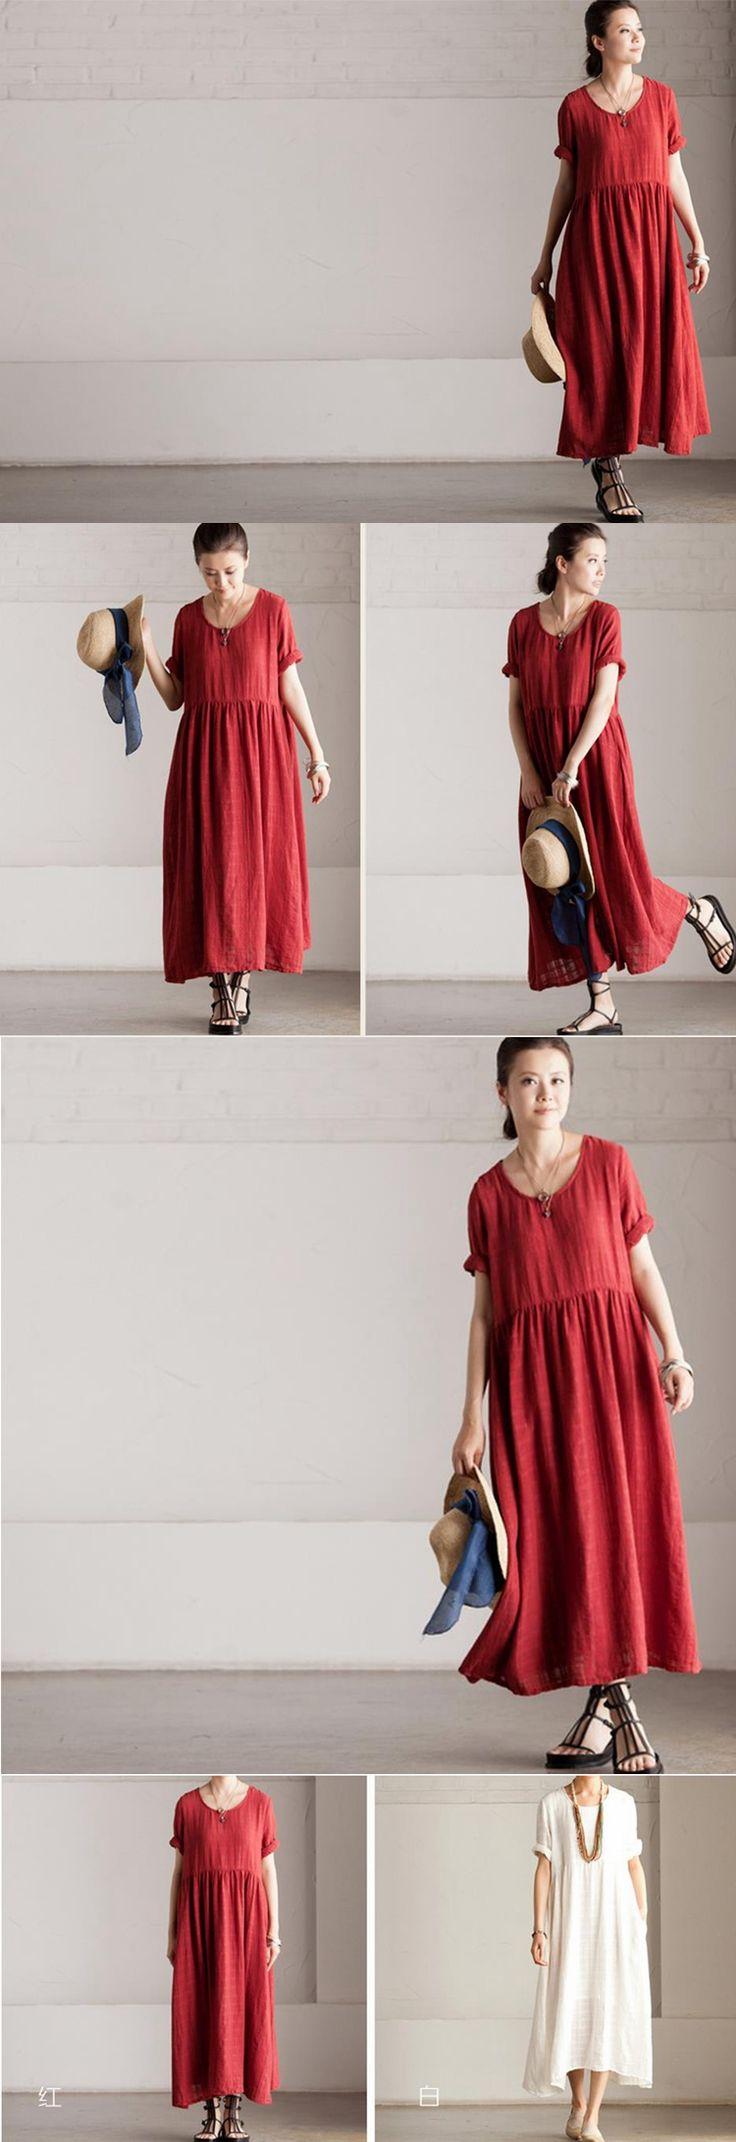 Summer Linen Fashion Red Dress -Maxi Dress Loose Cotton Tops Short Sleeve Leisure Blouse - Women's Dress- Women Clothing Q155A